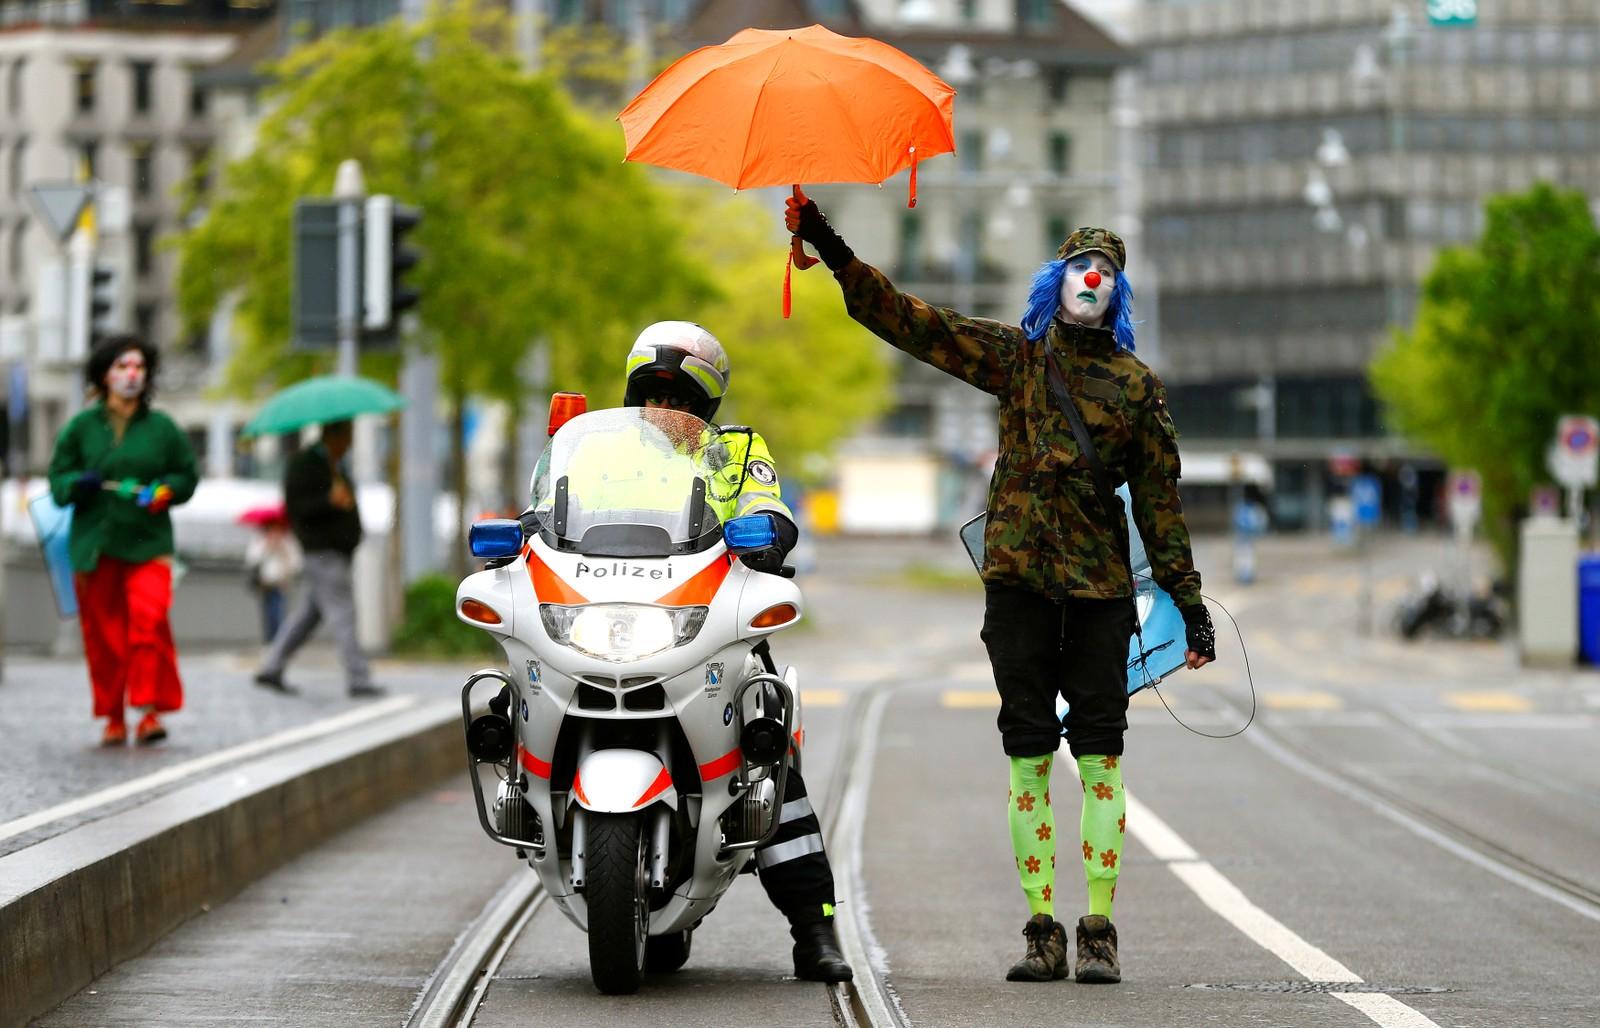 Da gikk det fredeligere for seg i under 1. mai-markeringen i Zurich i Sveits.